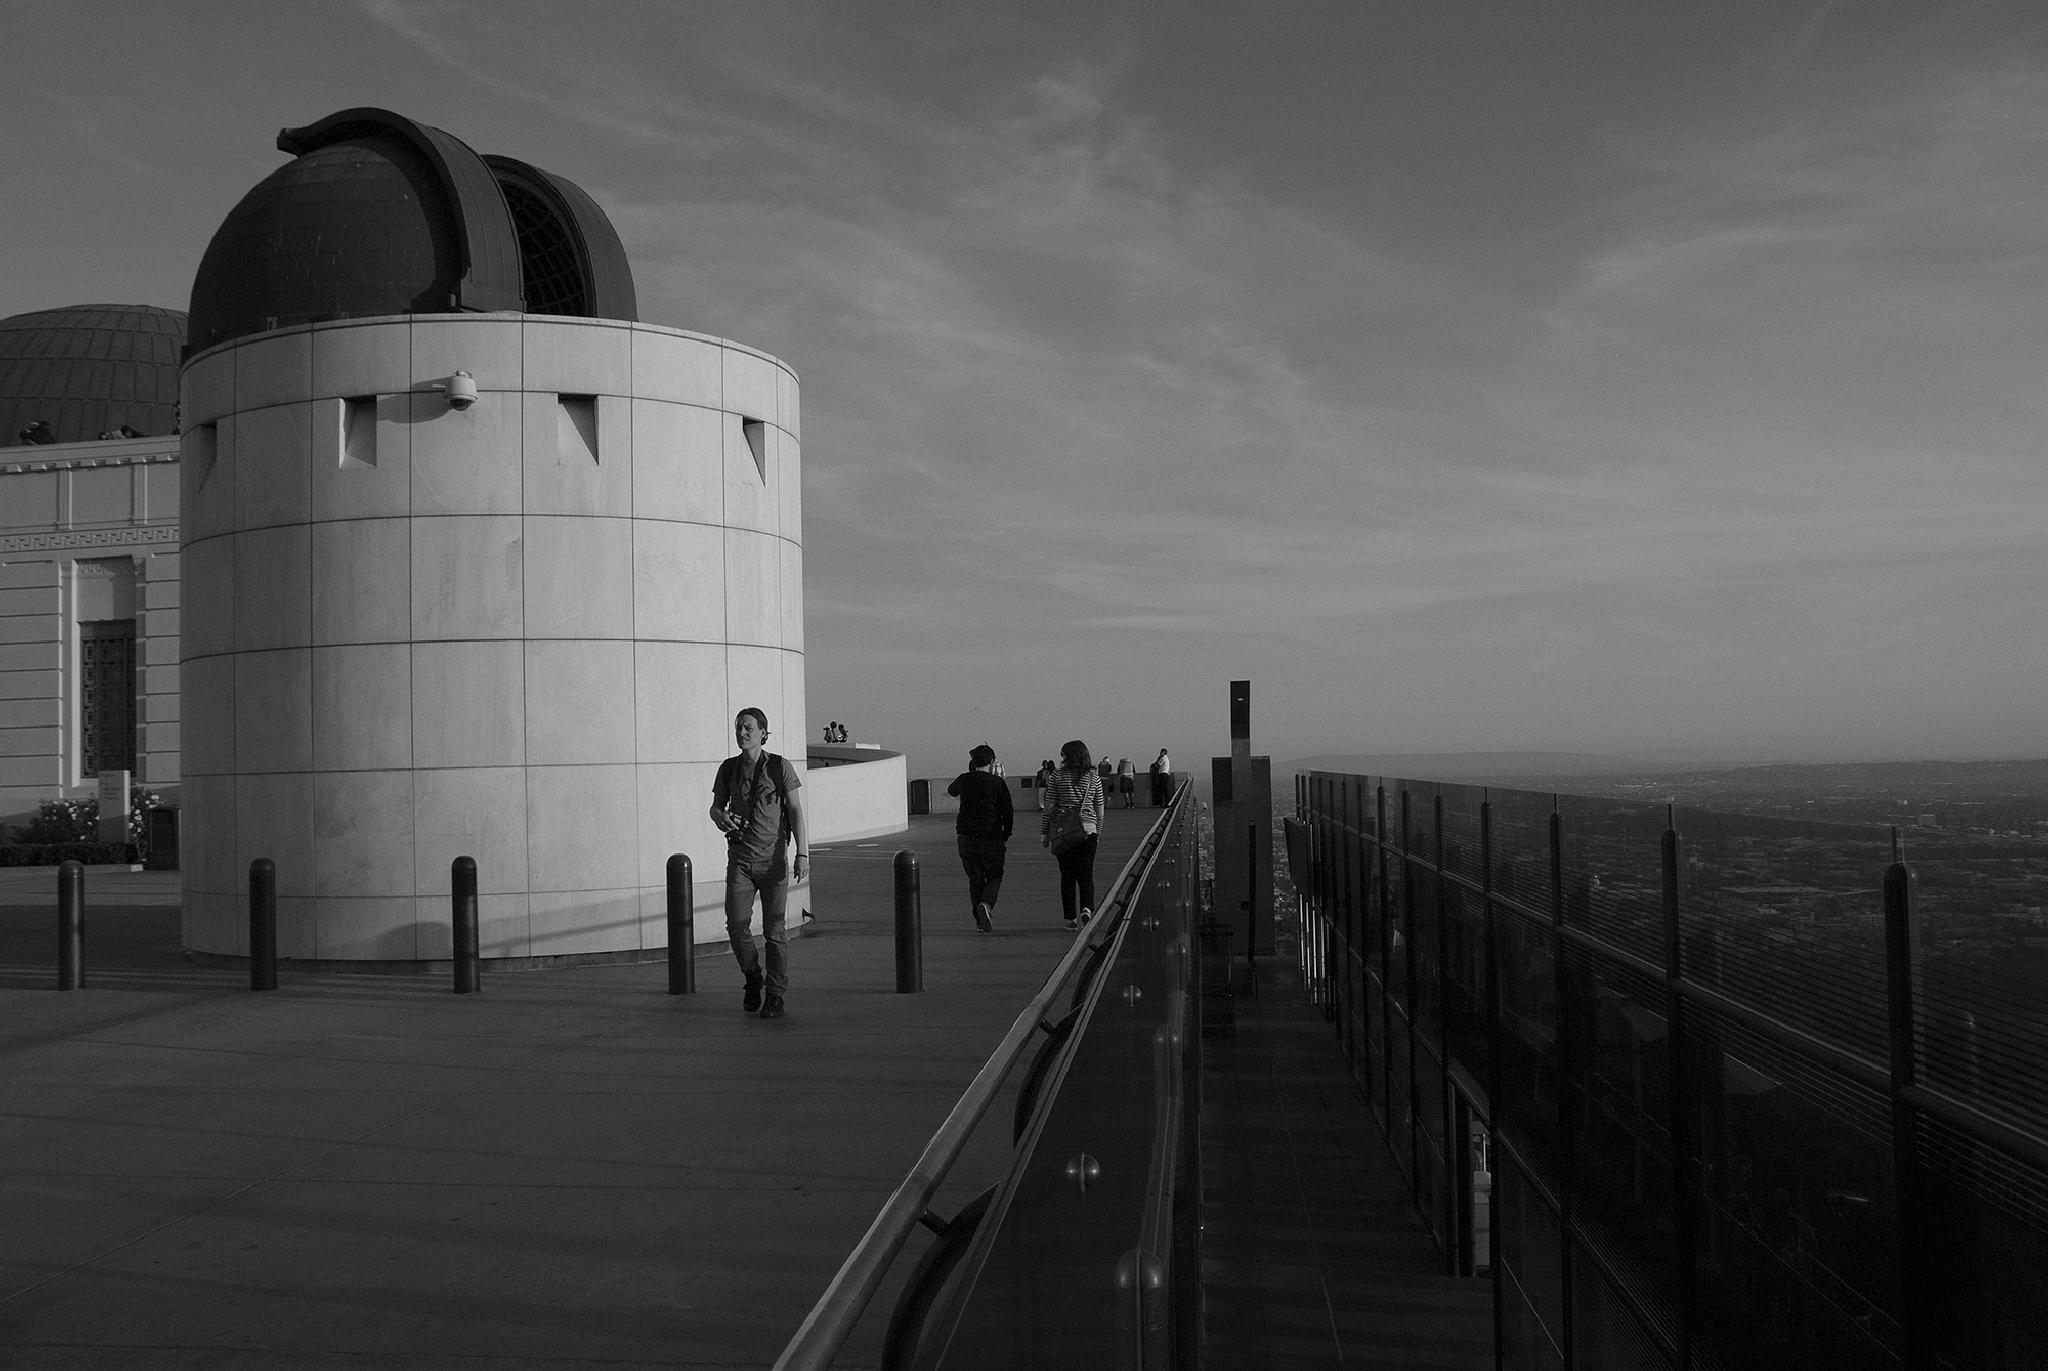 Observatory, Los angeles by Jaime O. Frias